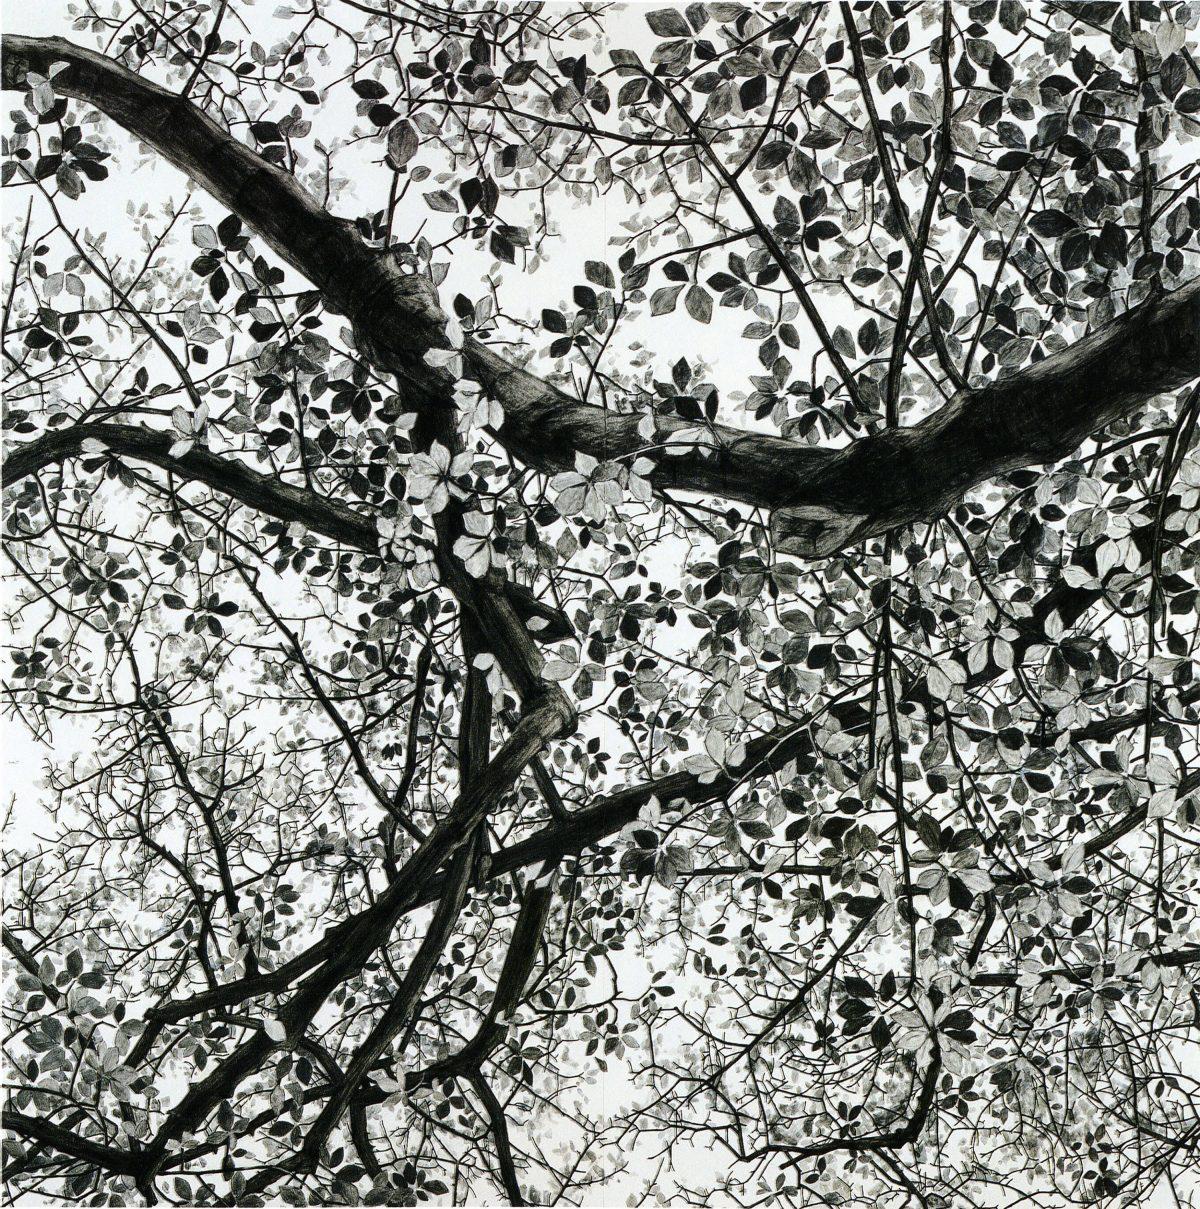 「空との距離 Ⅱ」2002年 / h.240×w.240 cm / 麻紙, 岩絵具 / 新潟県立近代美術館・万代島美術館蔵 / 撮影:内田芳孝